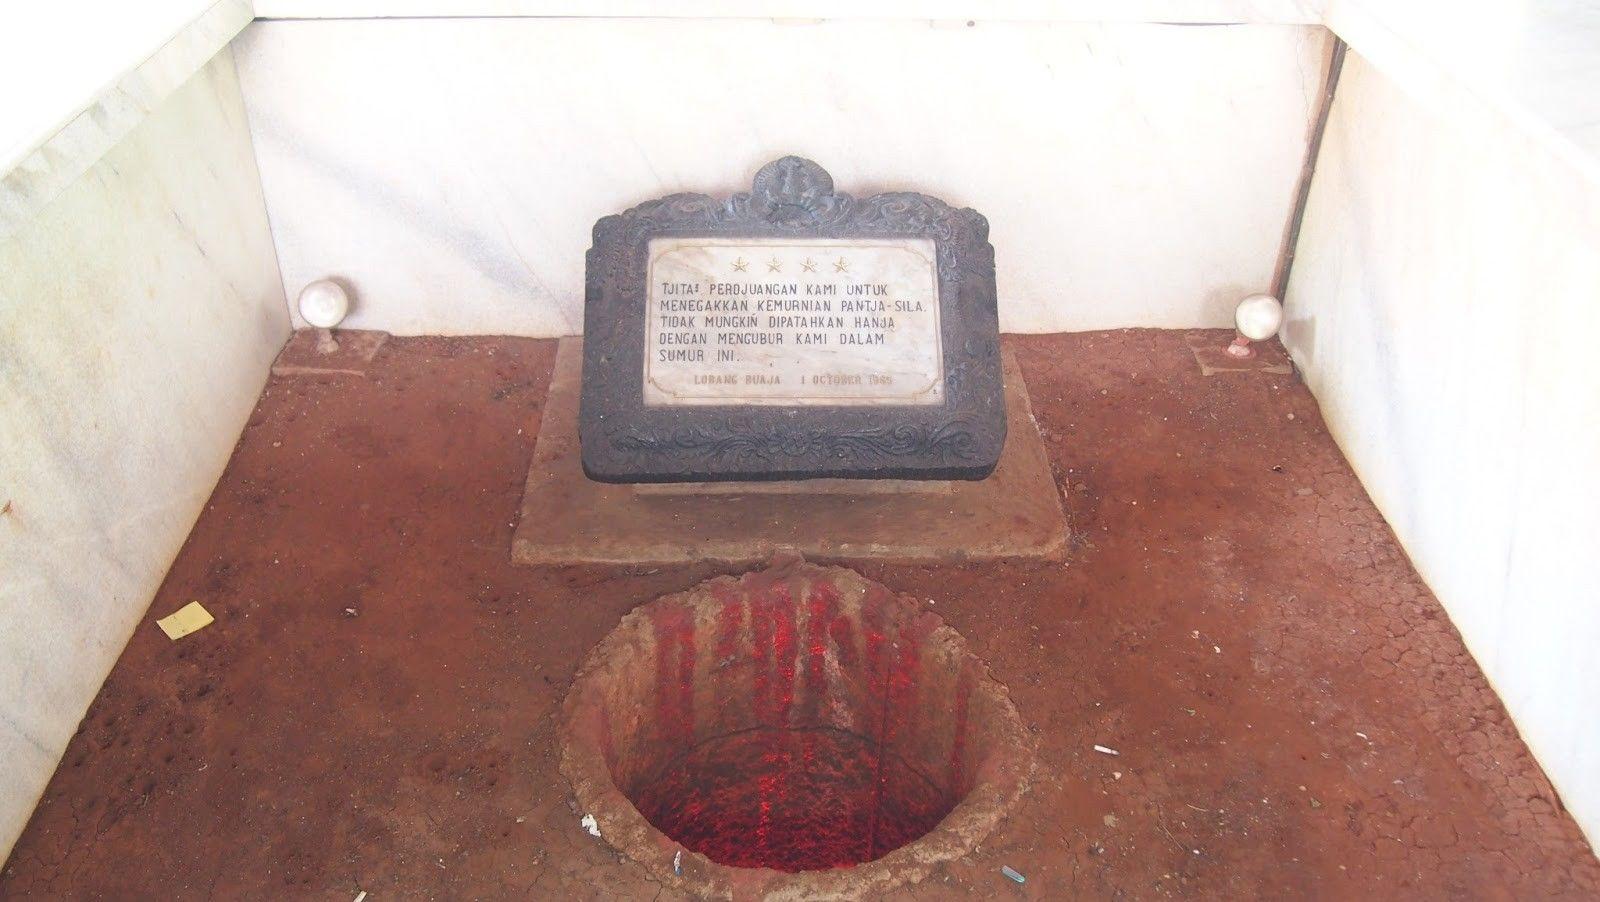 LUBANG BUAYA. Lubang yang pada tahun 1965 digunakan untuk mengubur jasad tujuh jenderal usai dibunuh. Foto oleh ANTARA